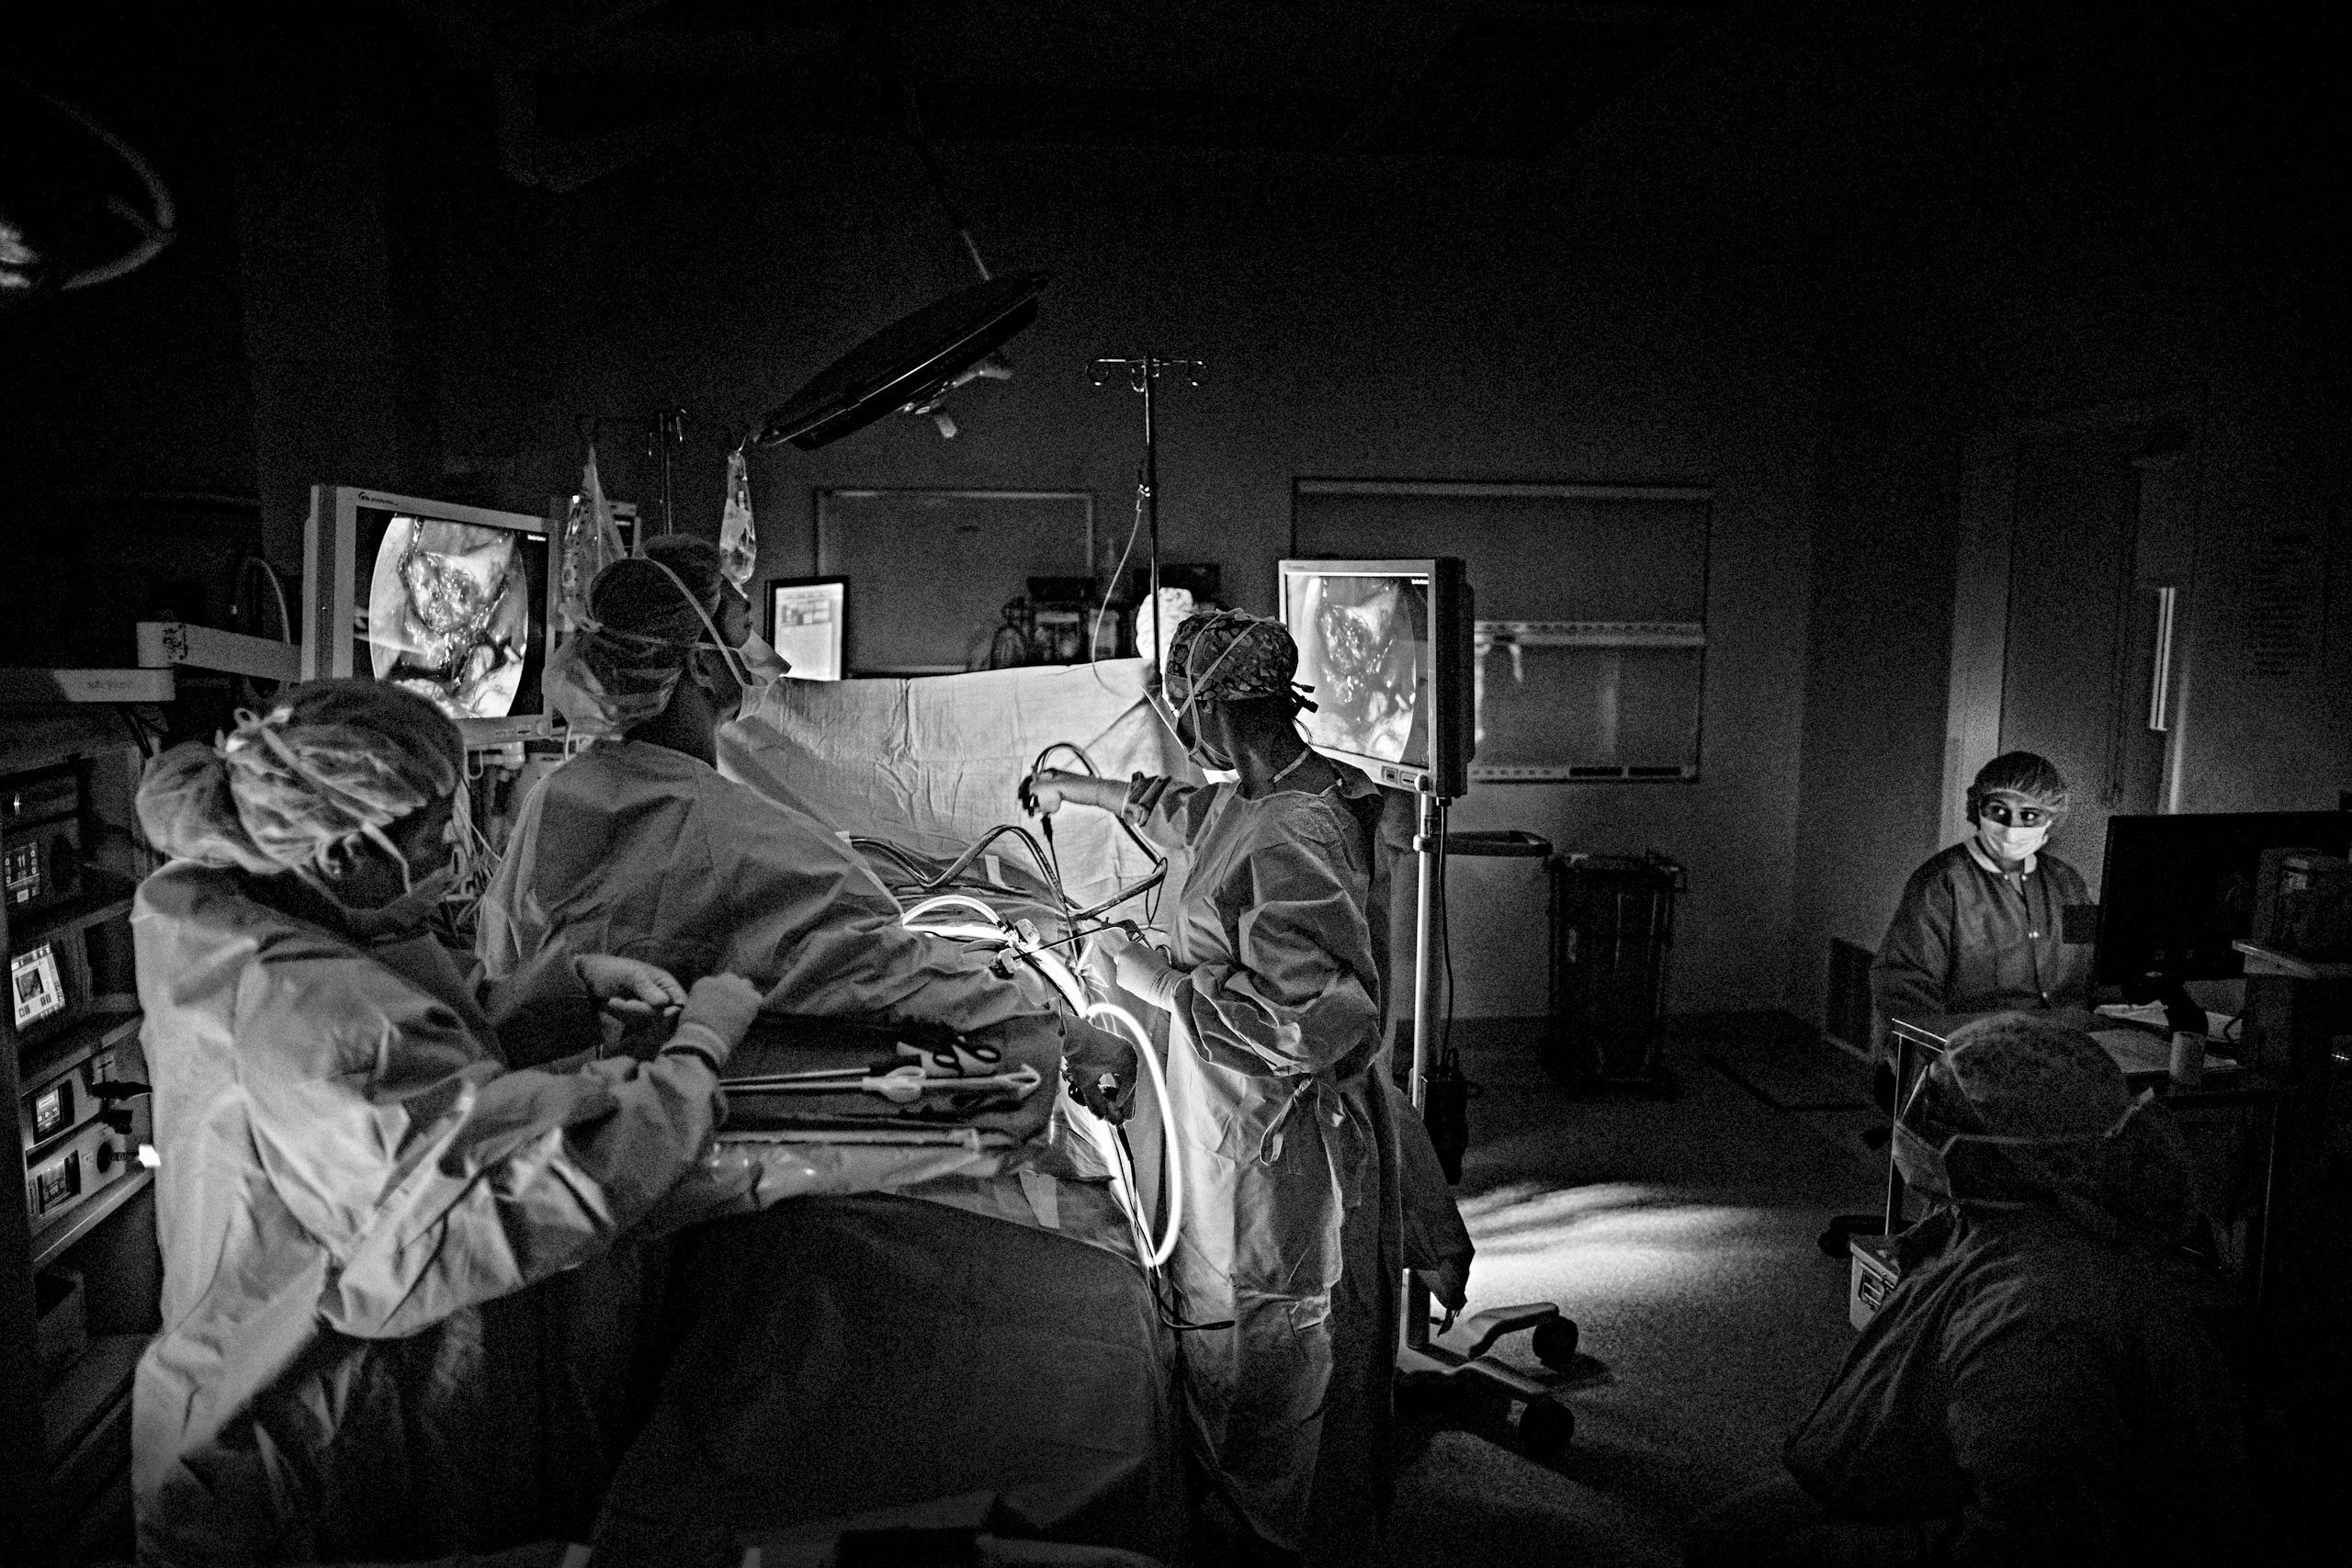 Dr. Salles performs a laparoscopic surgery toward the end of the evening, at Santa Clara Valley Medical Center in San Jose, California. March 28, 2015.